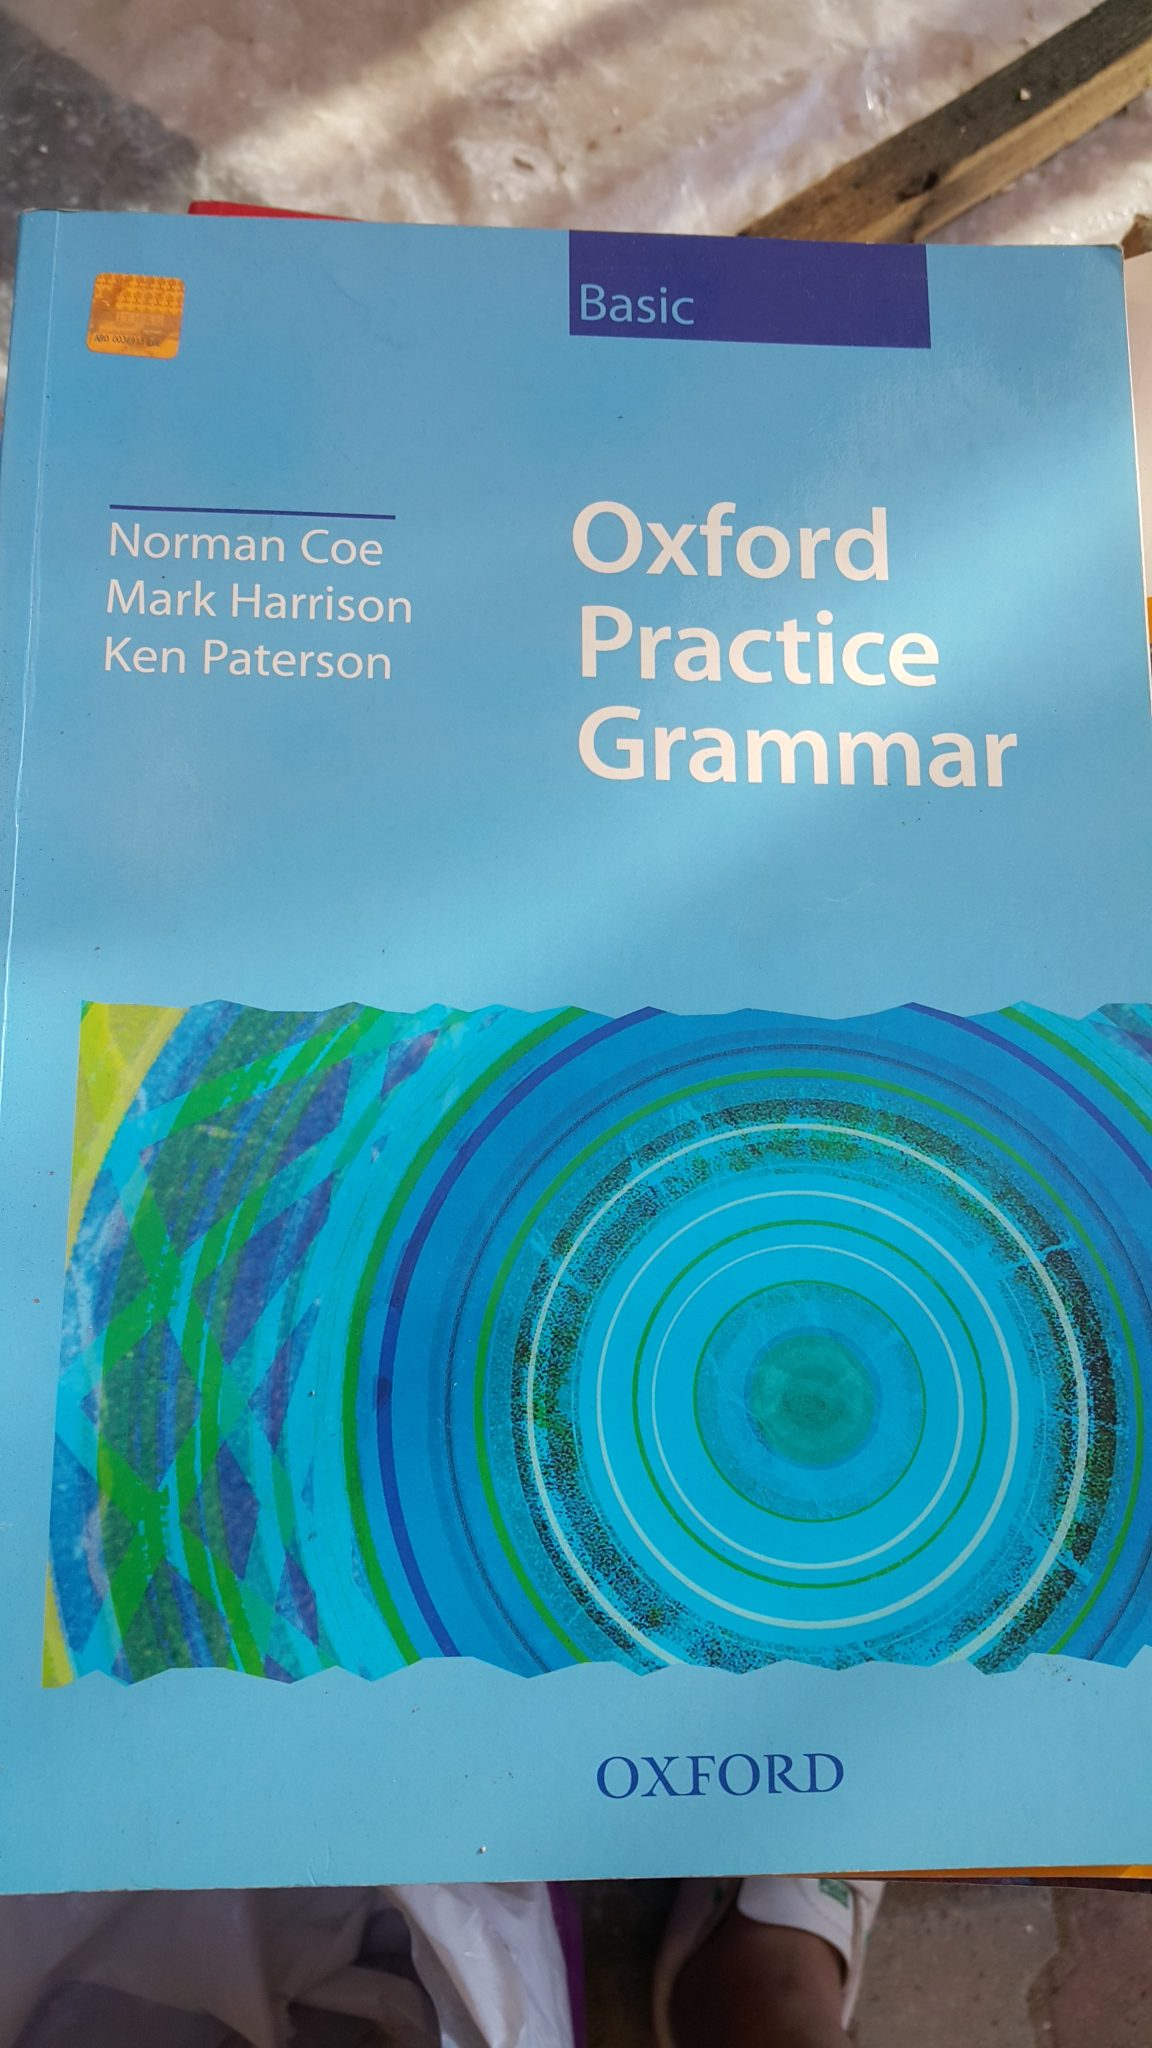 OXFORD PRACTİCE GRAMMAR. N.COE/M.HARRISON/K.PATERSON